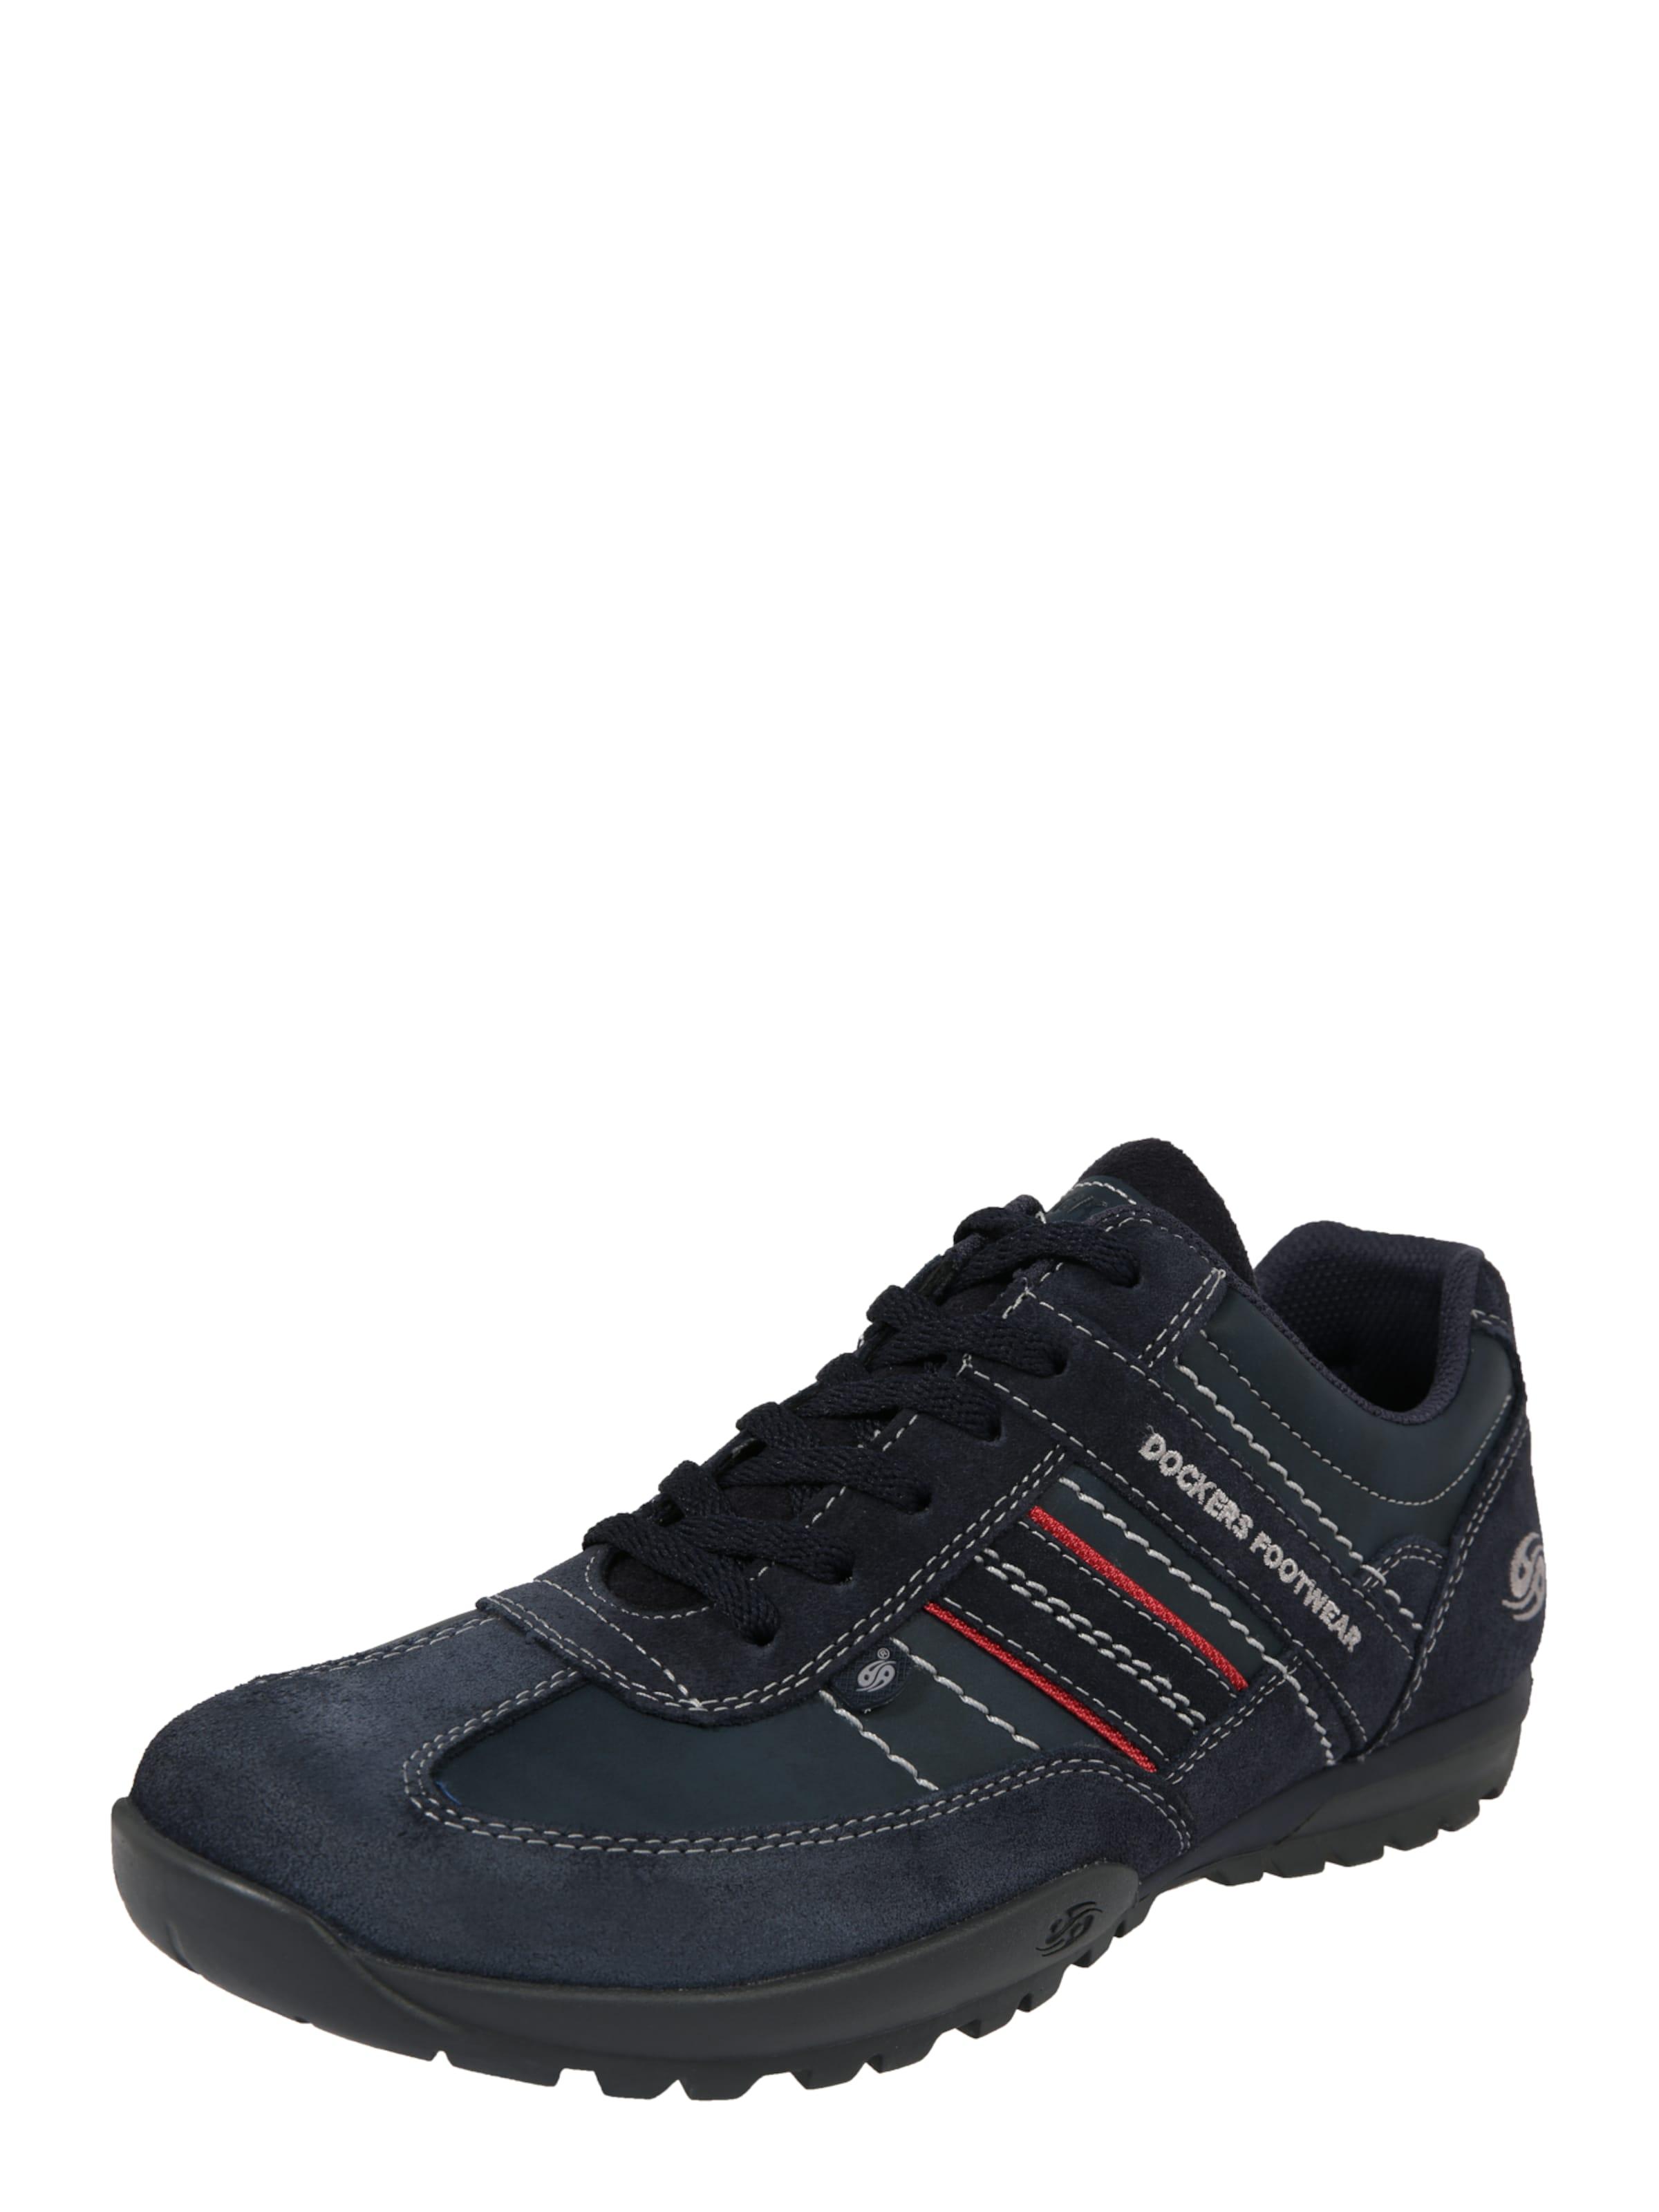 Dockers Gerli Sneaker By Weiß Rot In DunkelblauAnthrazit Y6ybfgv7